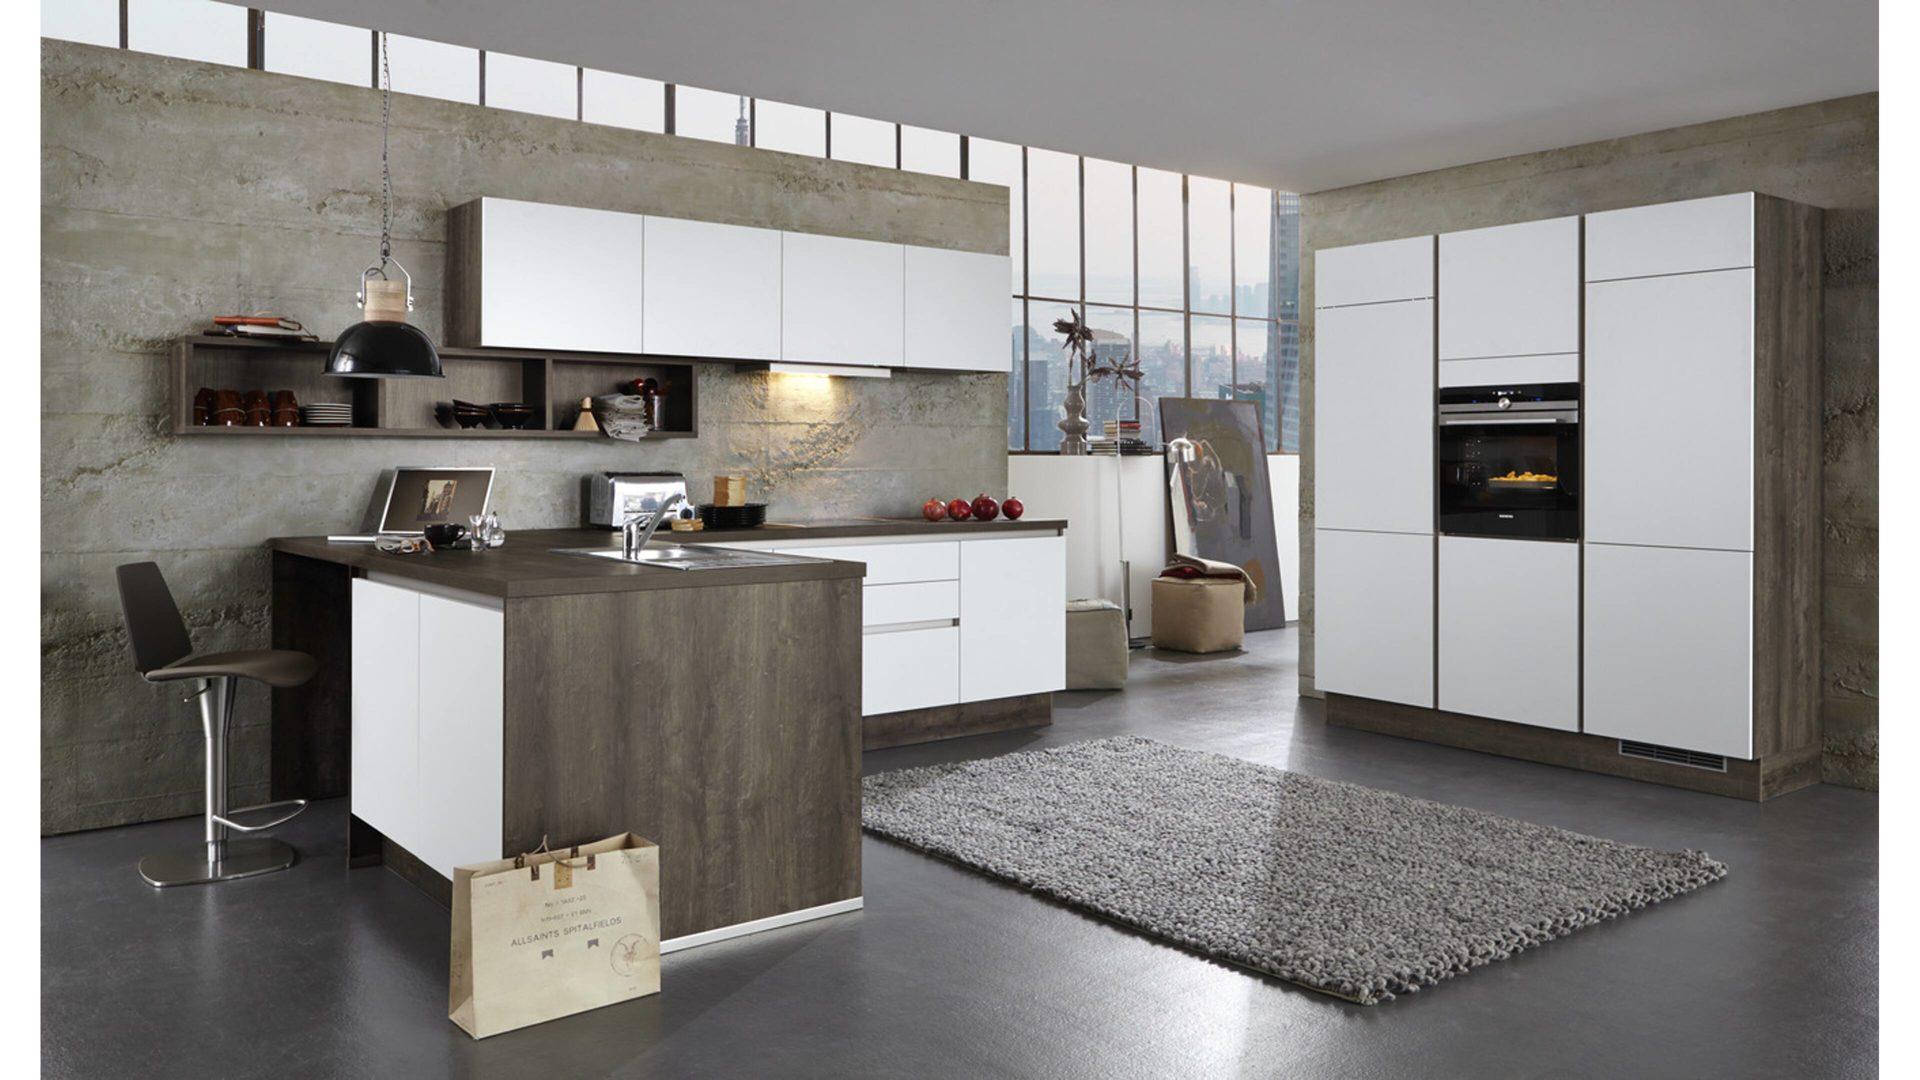 Möbel Boer Coesfeld, Möbel A-Z, Küchen, Culineo, Culineo L-Küche mit ...